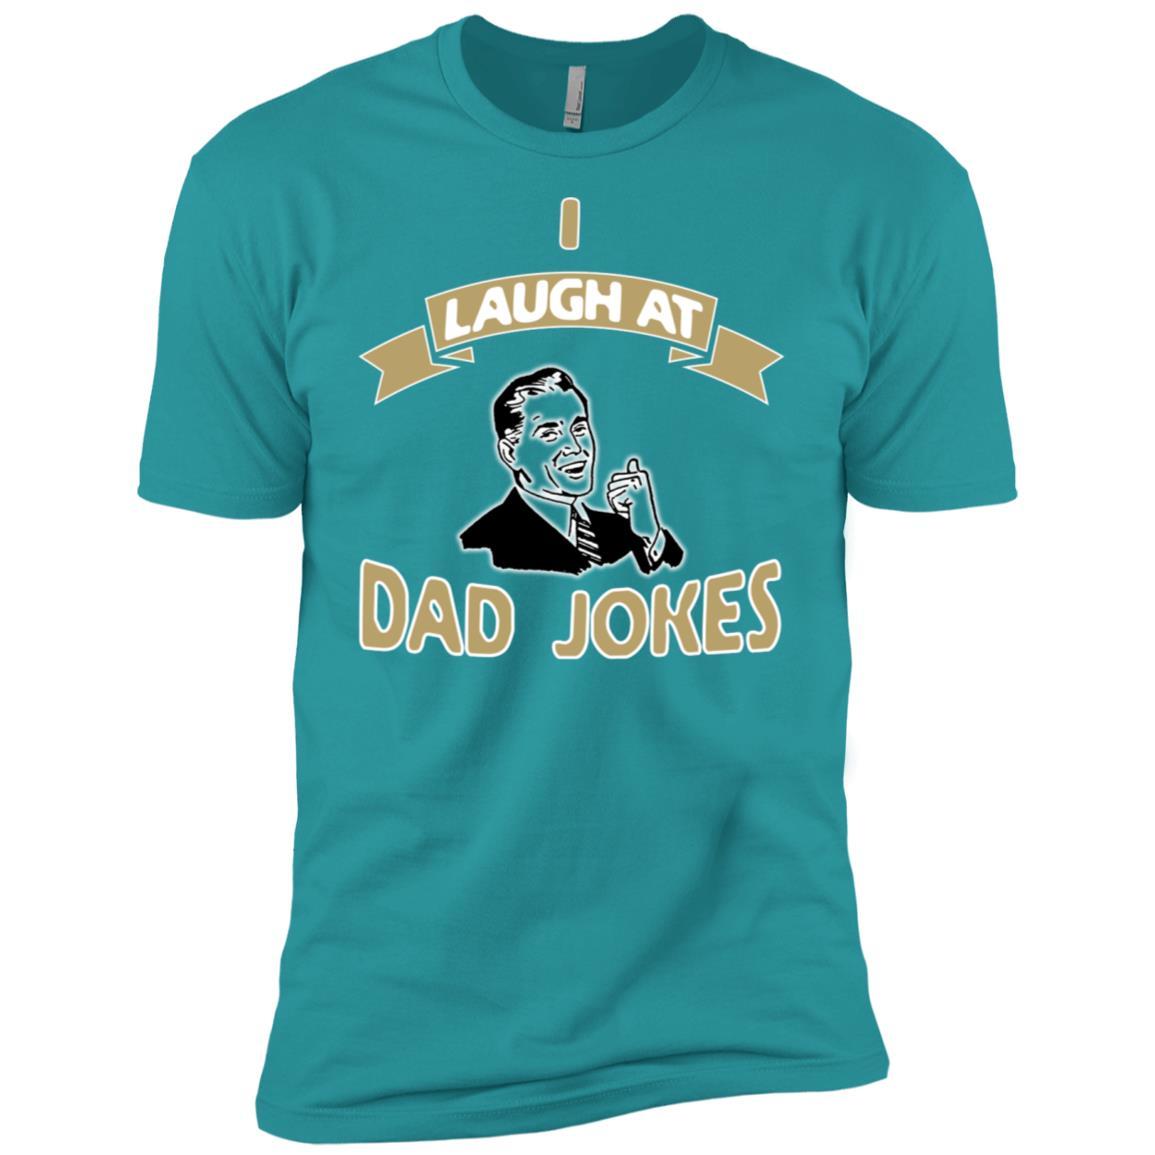 I Laugh At Dad Jokes Funny Men Short Sleeve T-Shirt